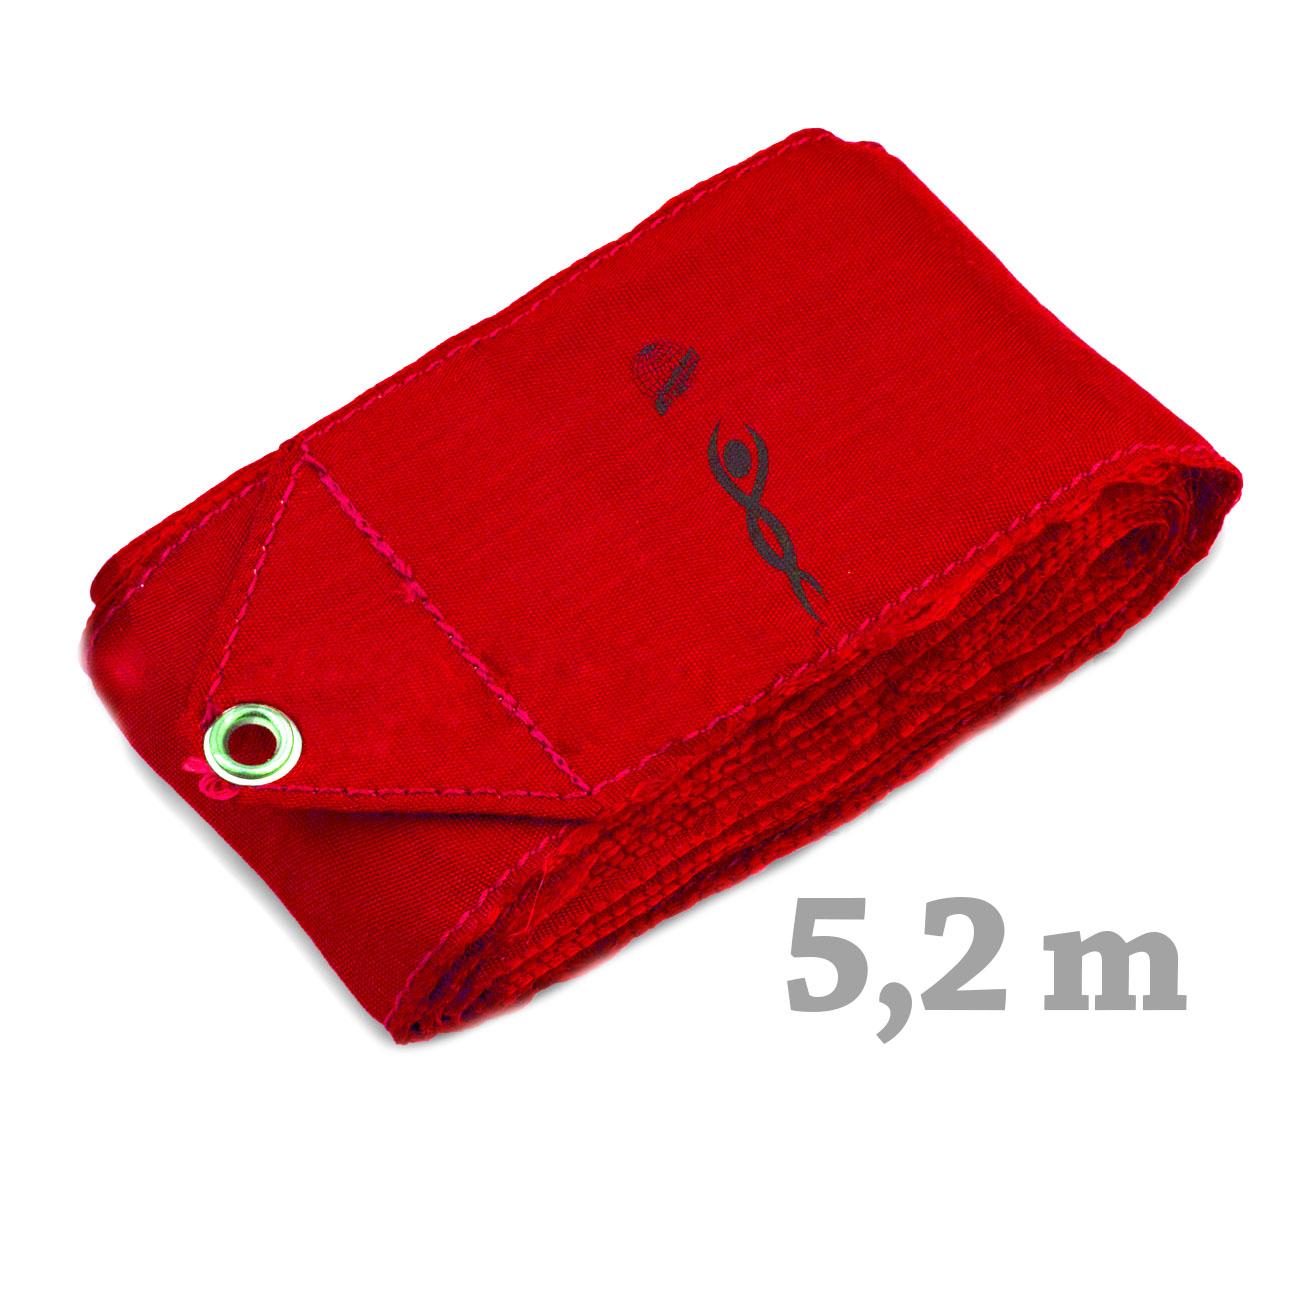 Cinta Gimnasia rítmica marca VNT (certificadas FIG) roja 5.2 m RIB516-016